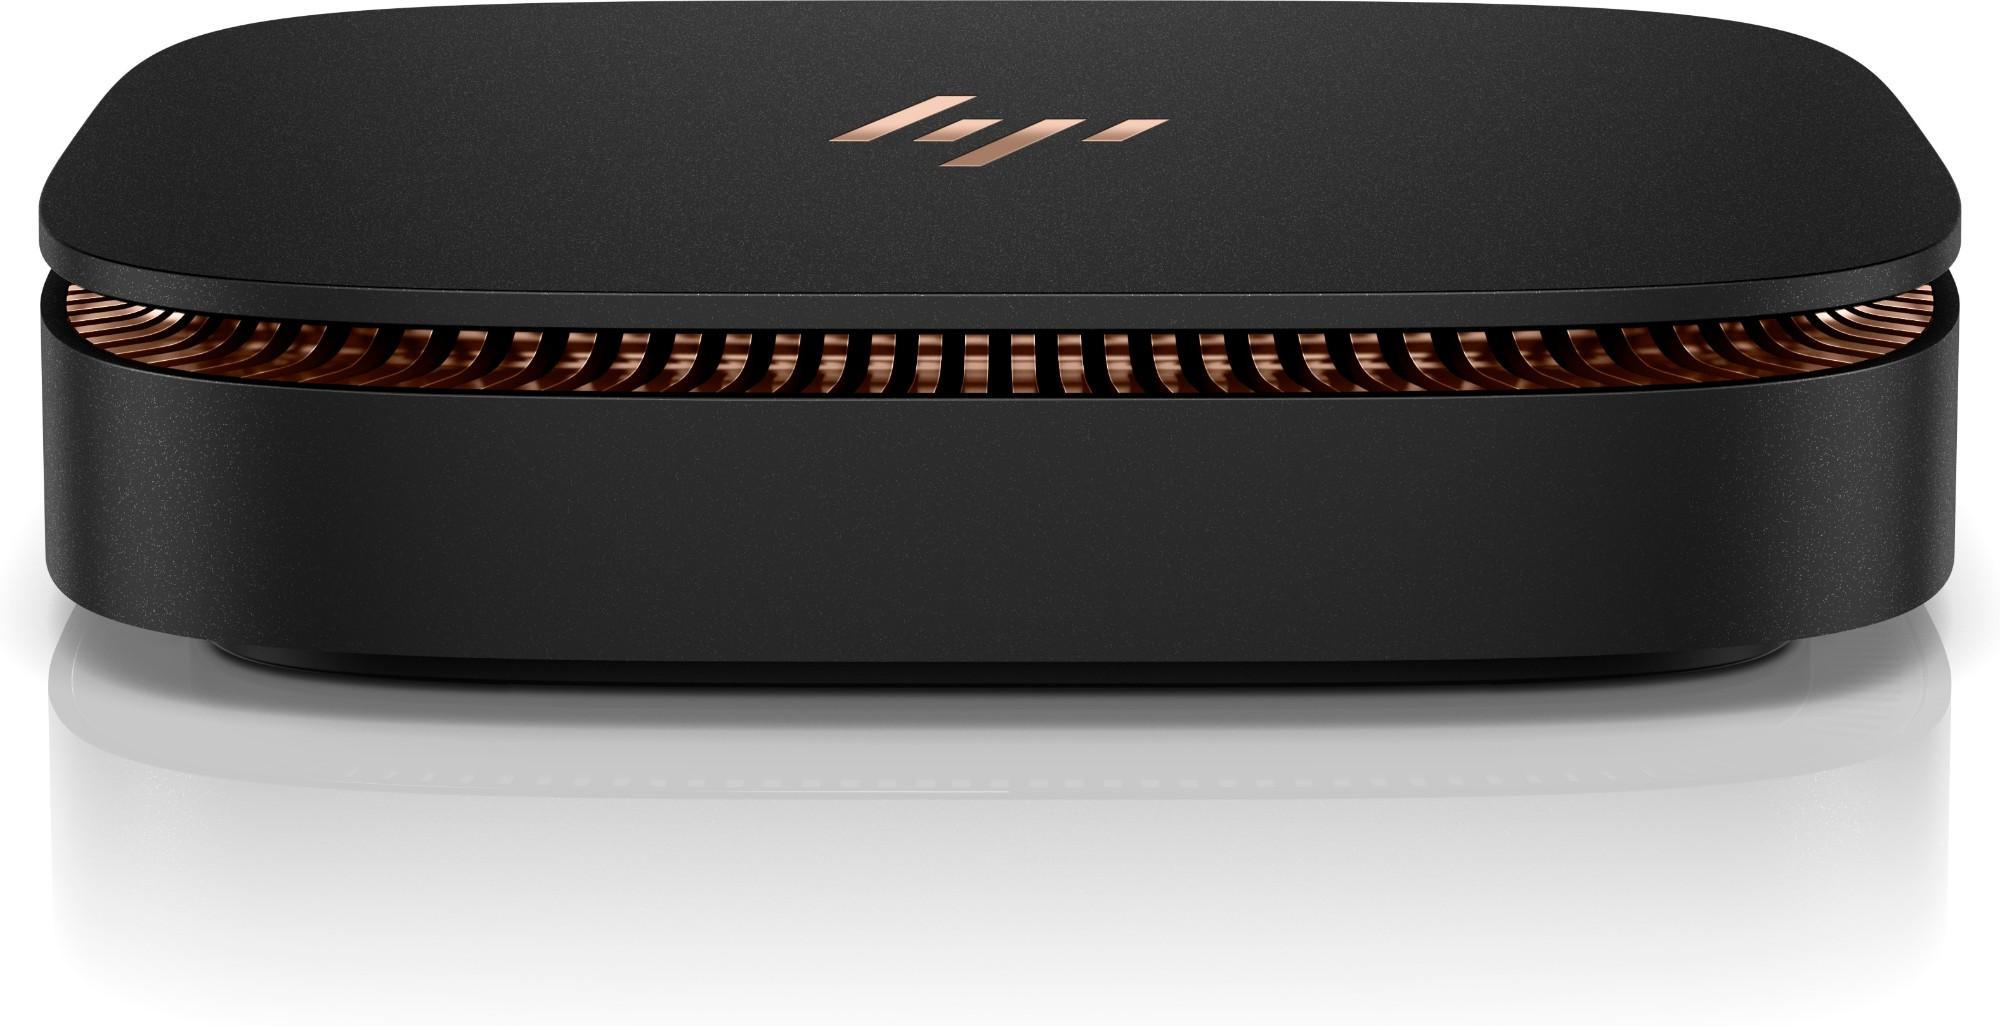 HP Elite Slice 3.2GHz i3-6100T USFF 6th gen Intel® Core™ i3 Black Mini PC